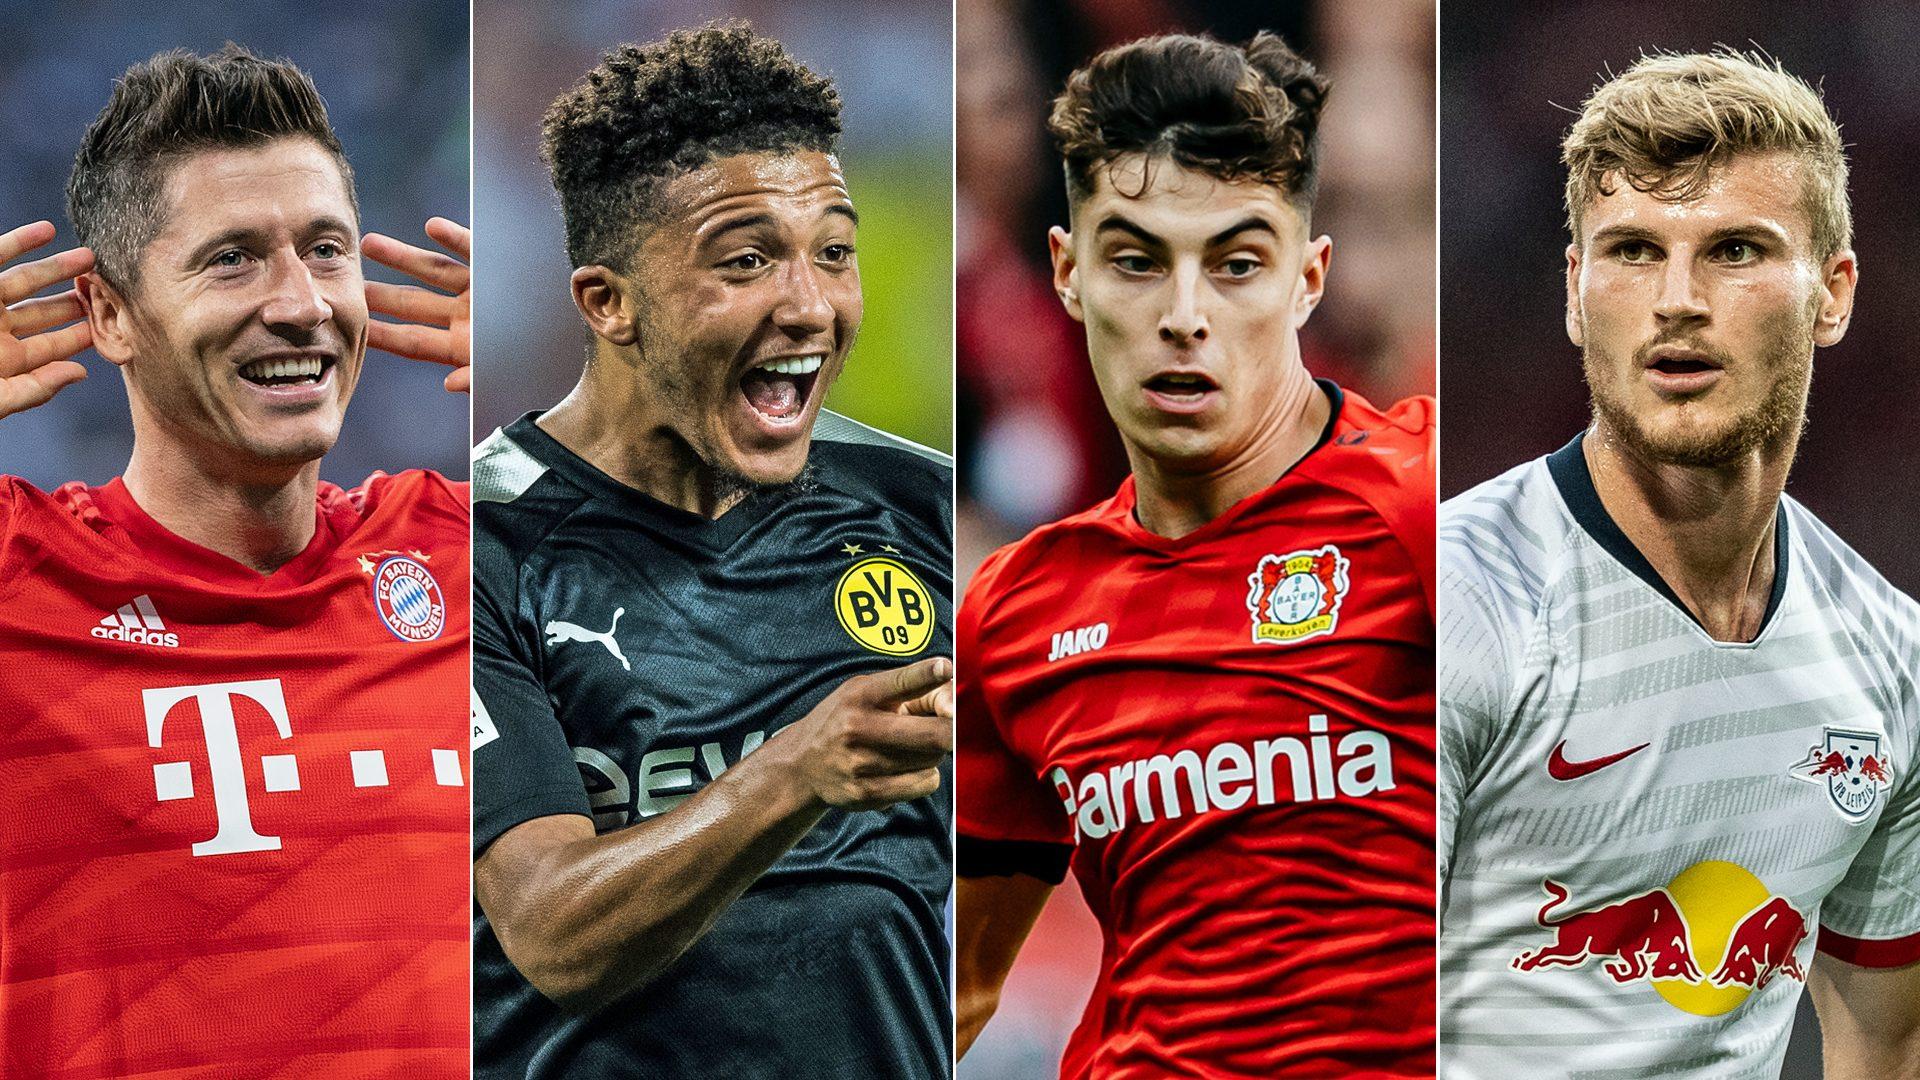 Bundesliga Uefa Champions League Group Stage Draw Find